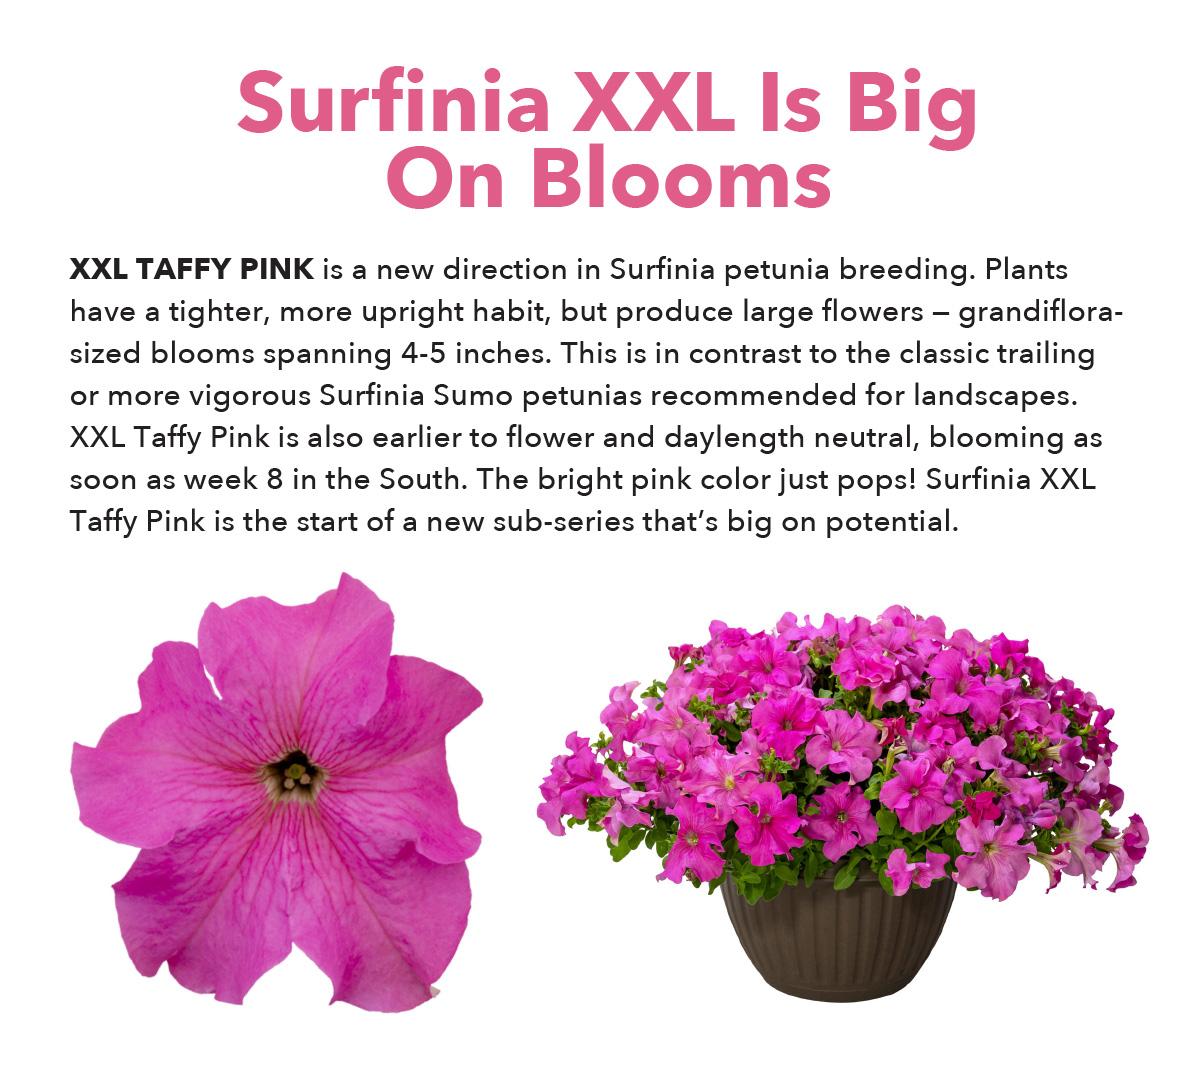 Surfinia XXL Taffy Pink